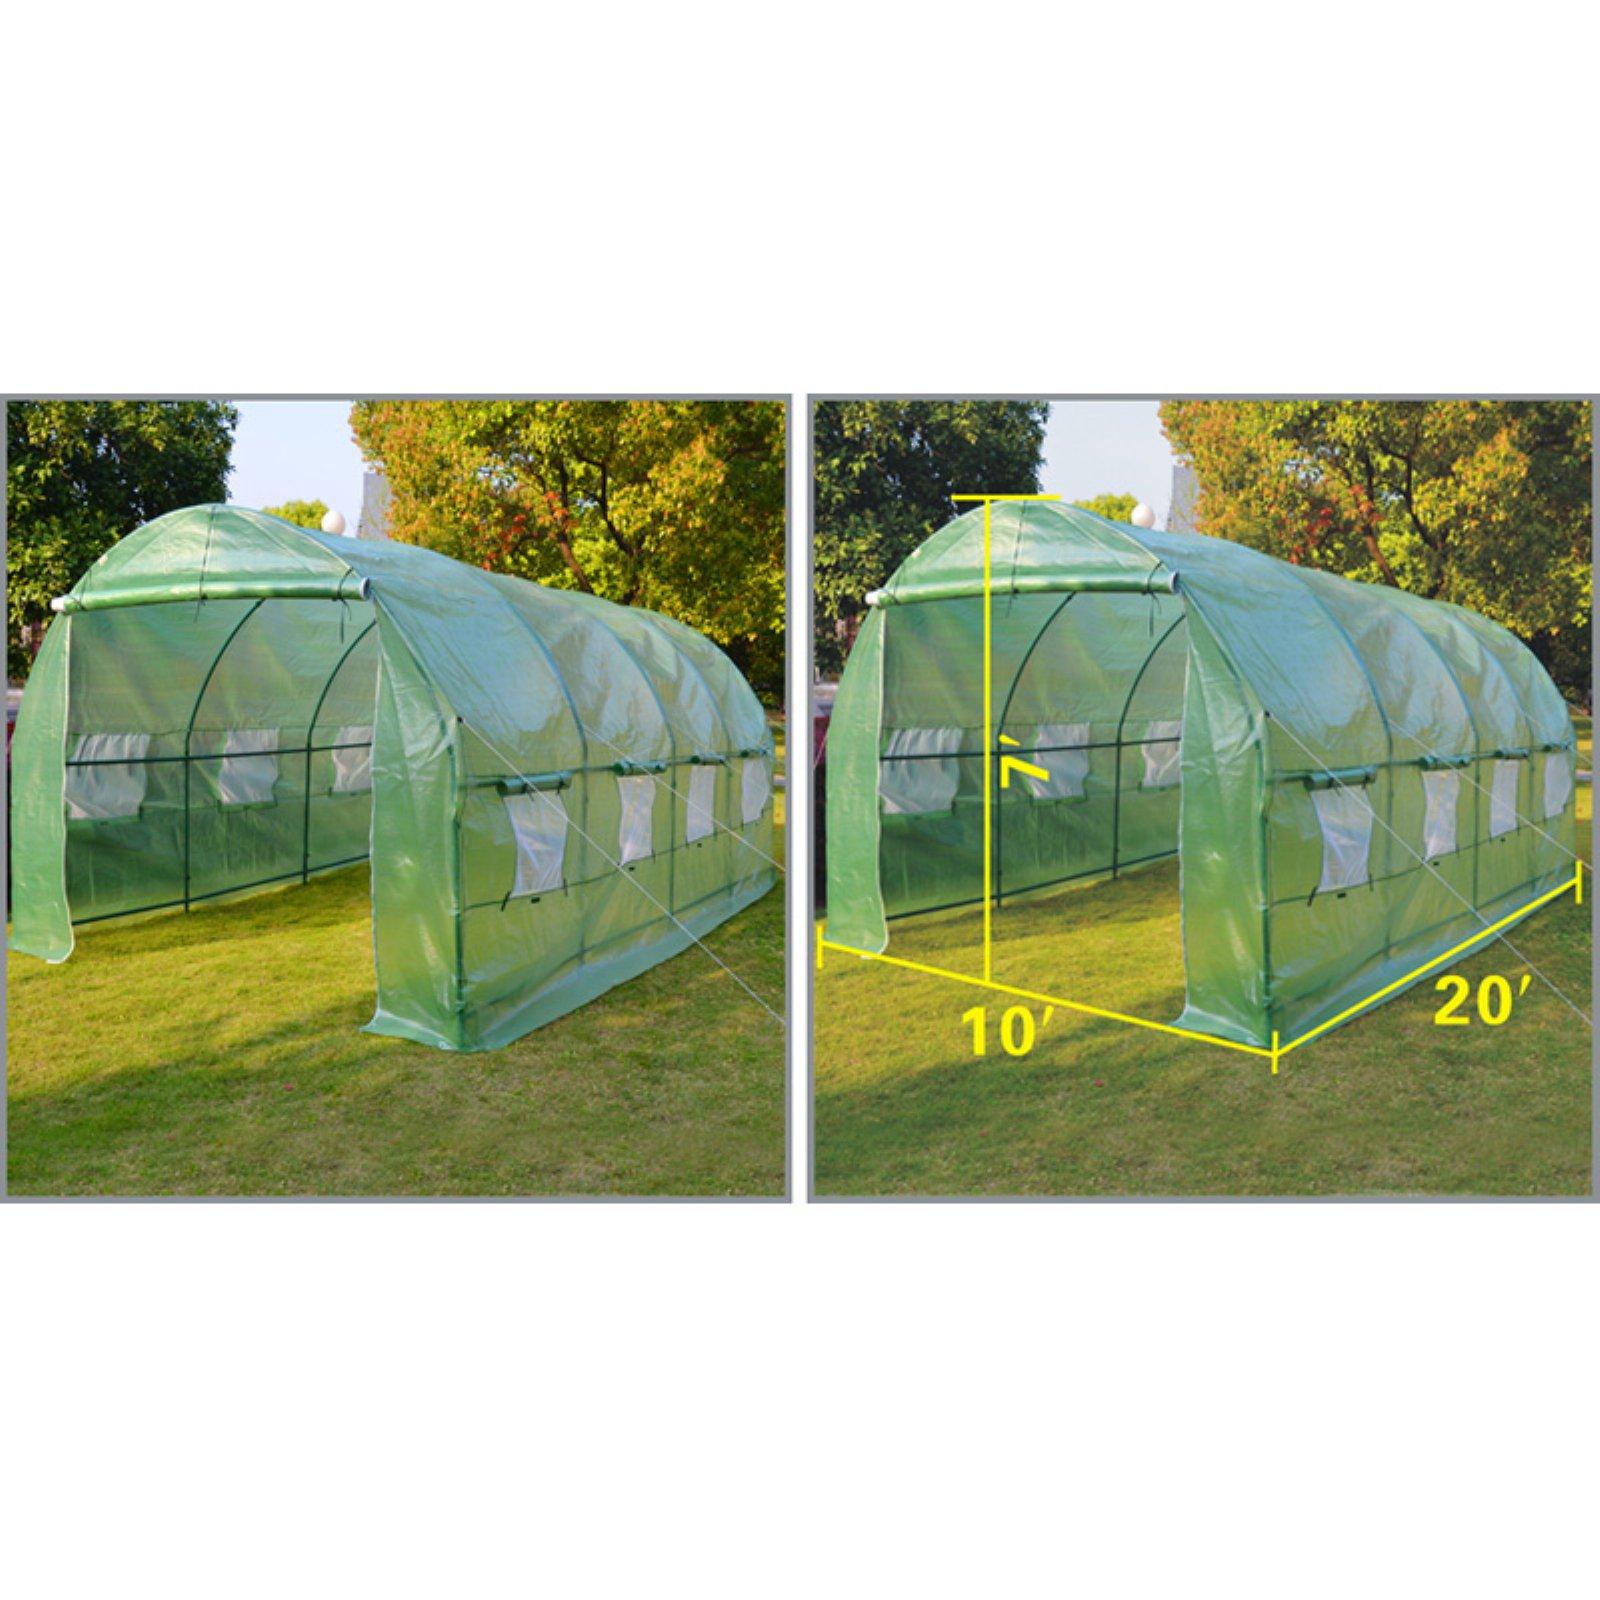 Sunrise Umbrella Outdoor Plant Gardening 20L x 10W x 7H ft. Walk-In Greenhouse